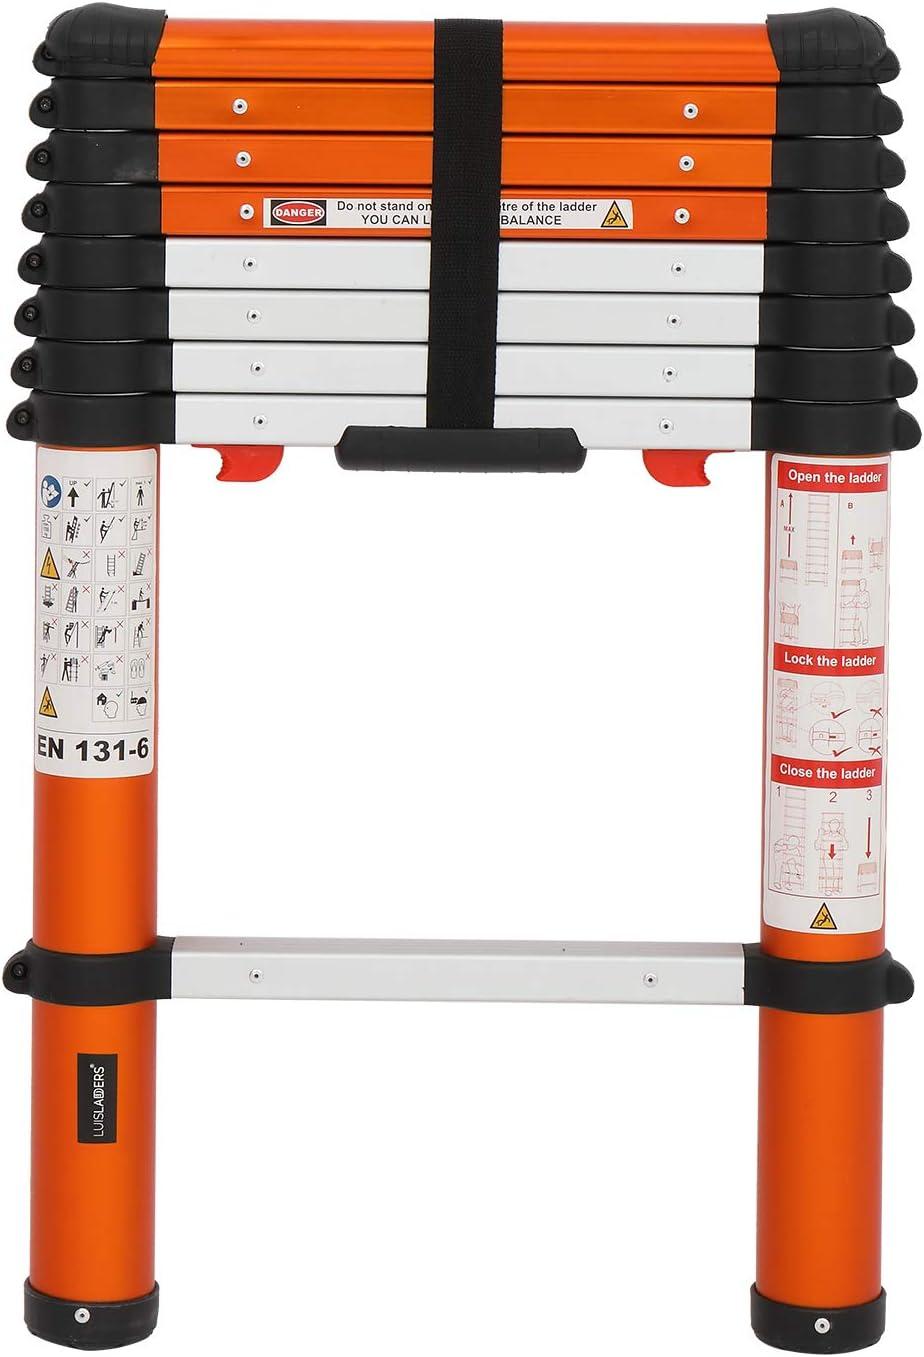 Luisladders Telescoping Ladder Multi-Use Telescopic Extension Ladder